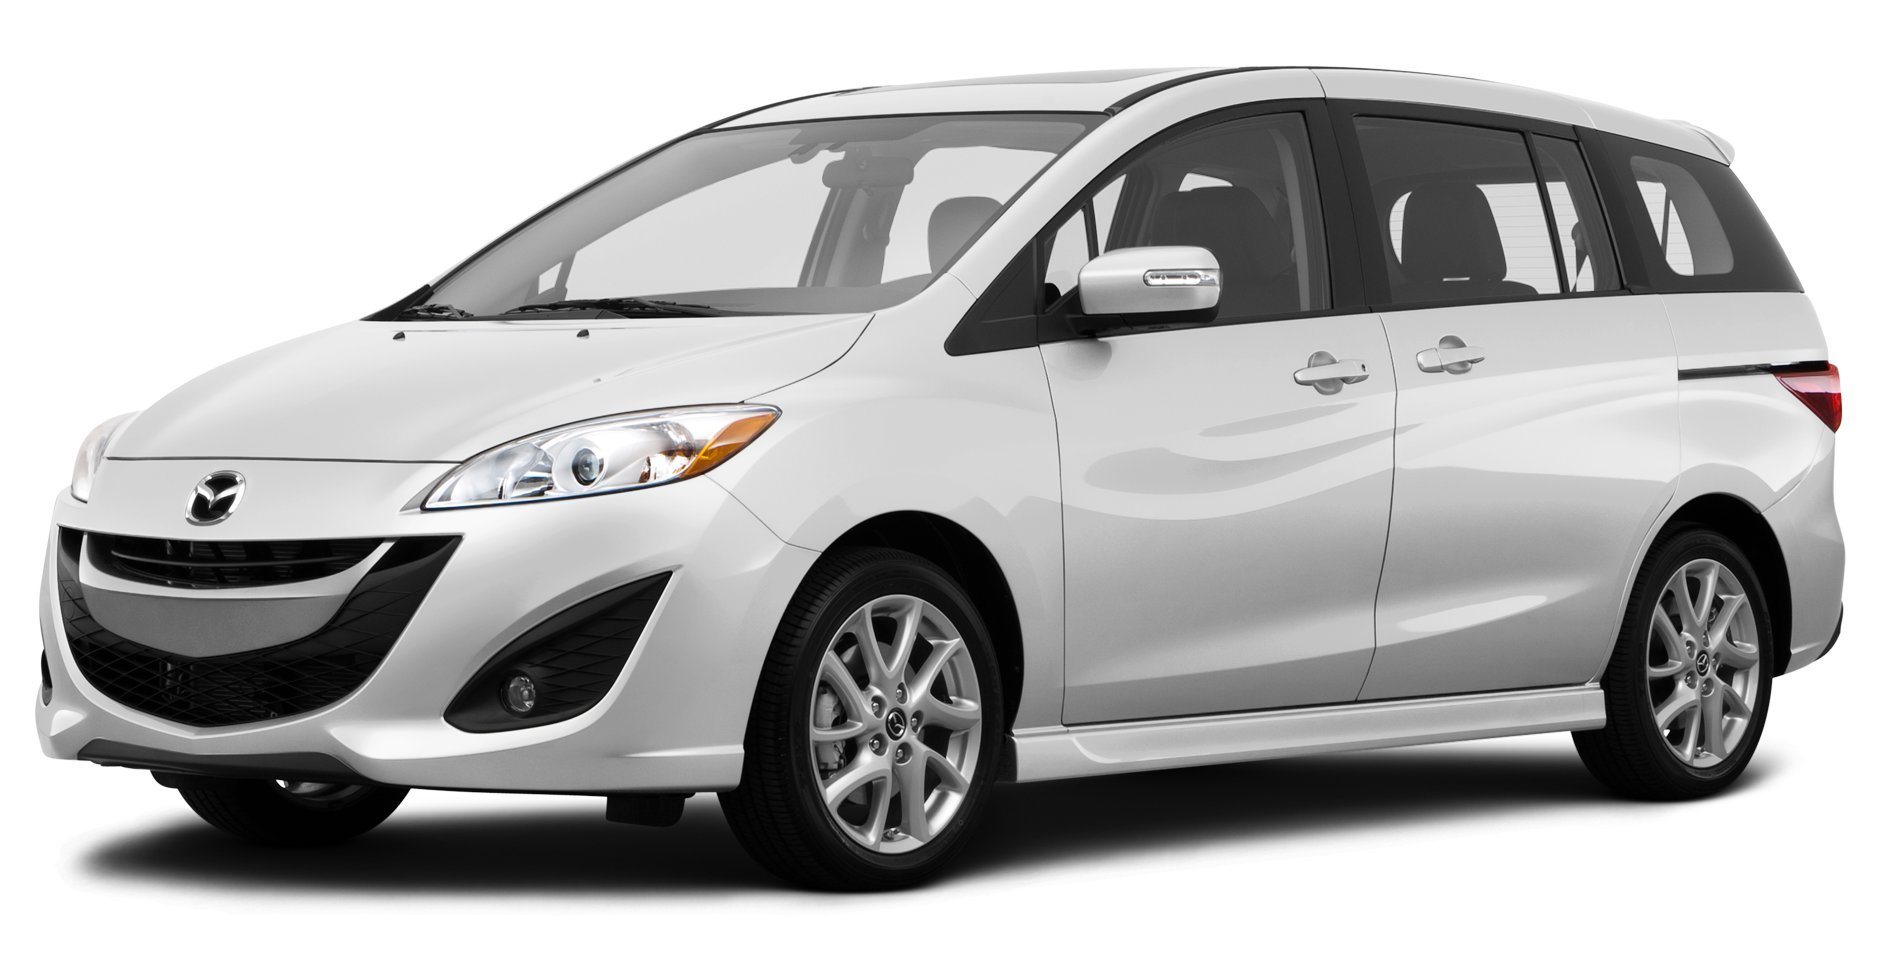 Kelebihan Mazda 5 2014 Harga